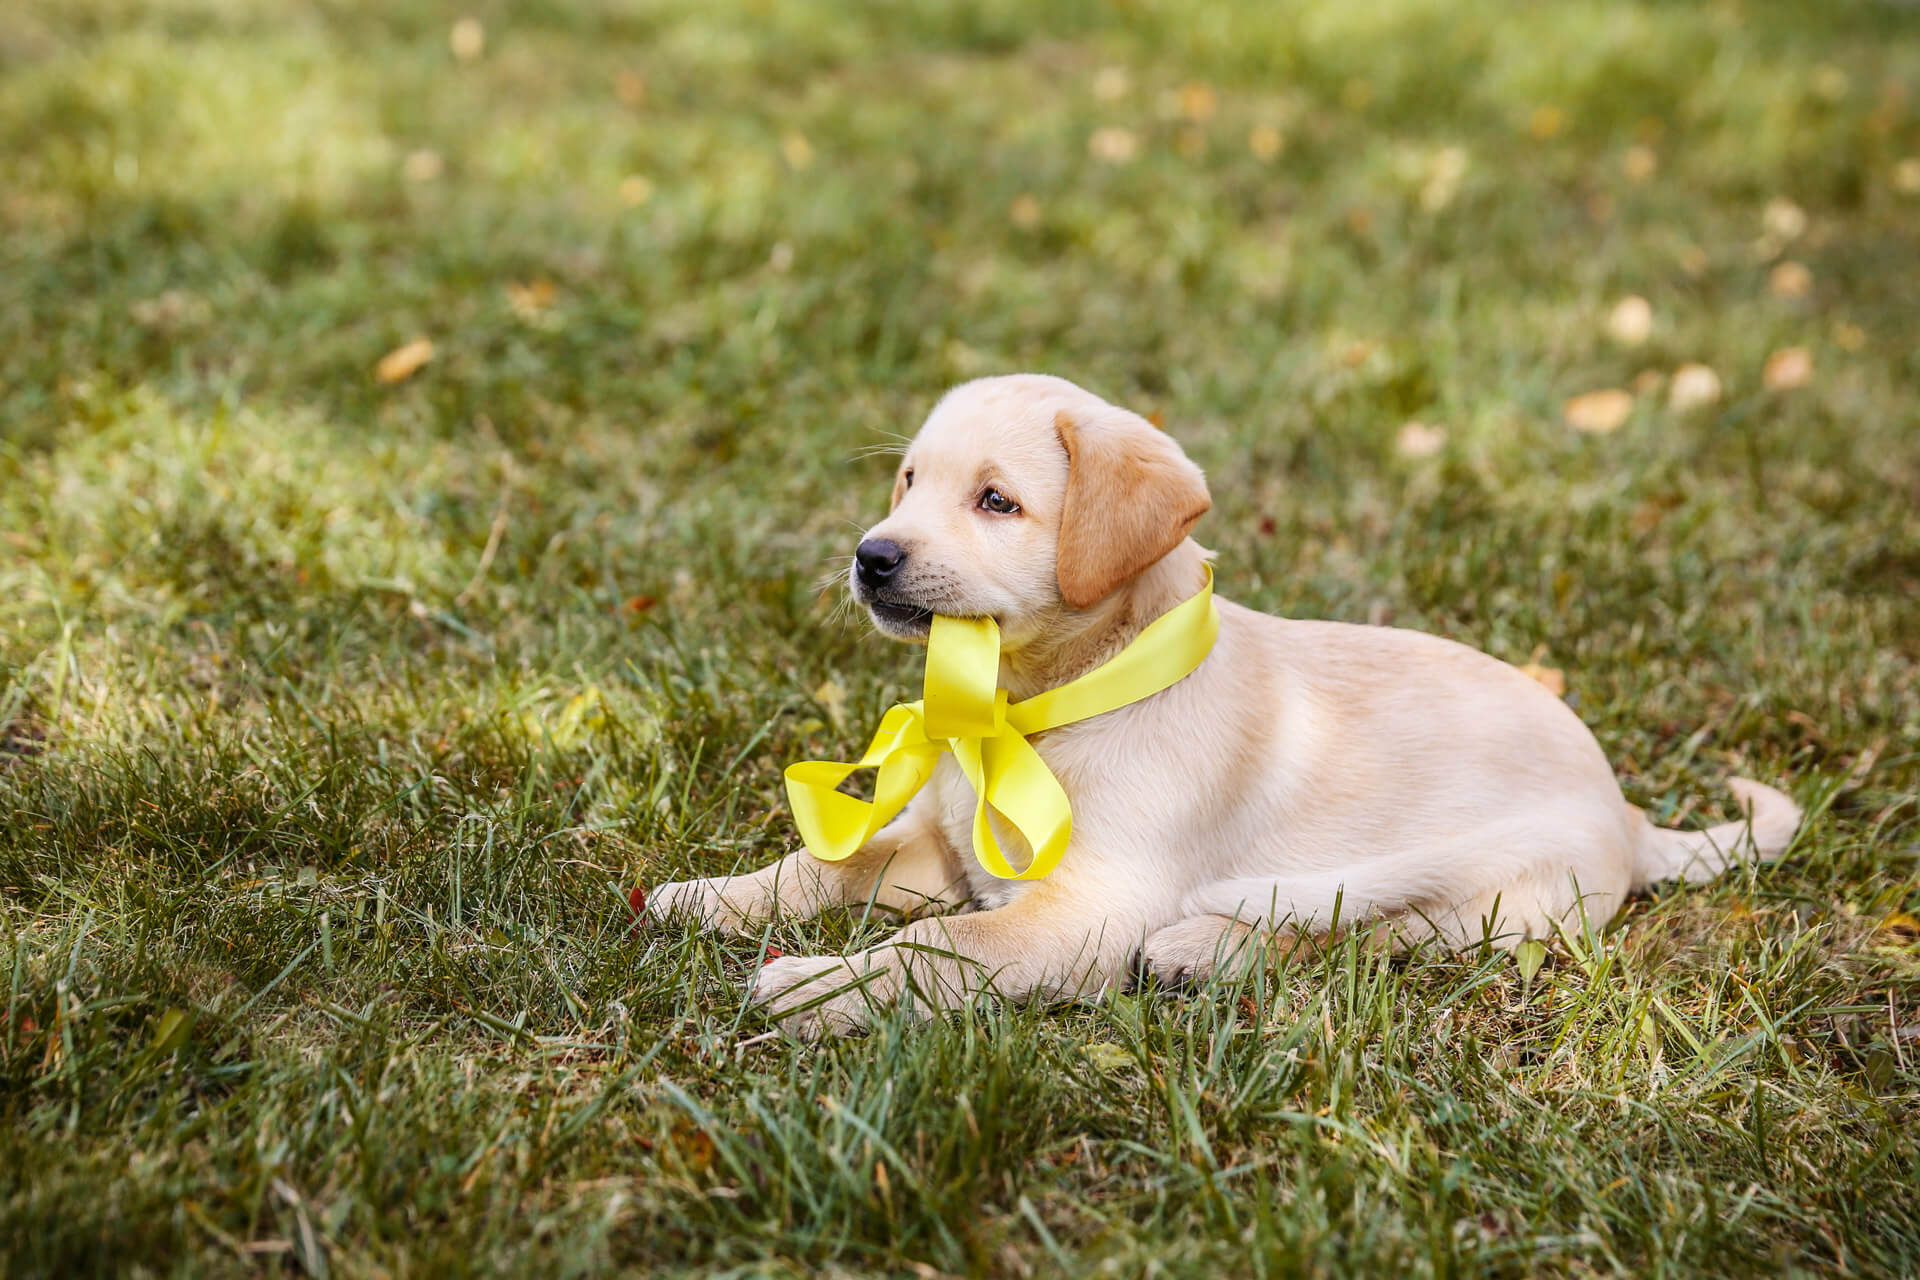 puppy dog sitting in grass wearing yellow ribbon